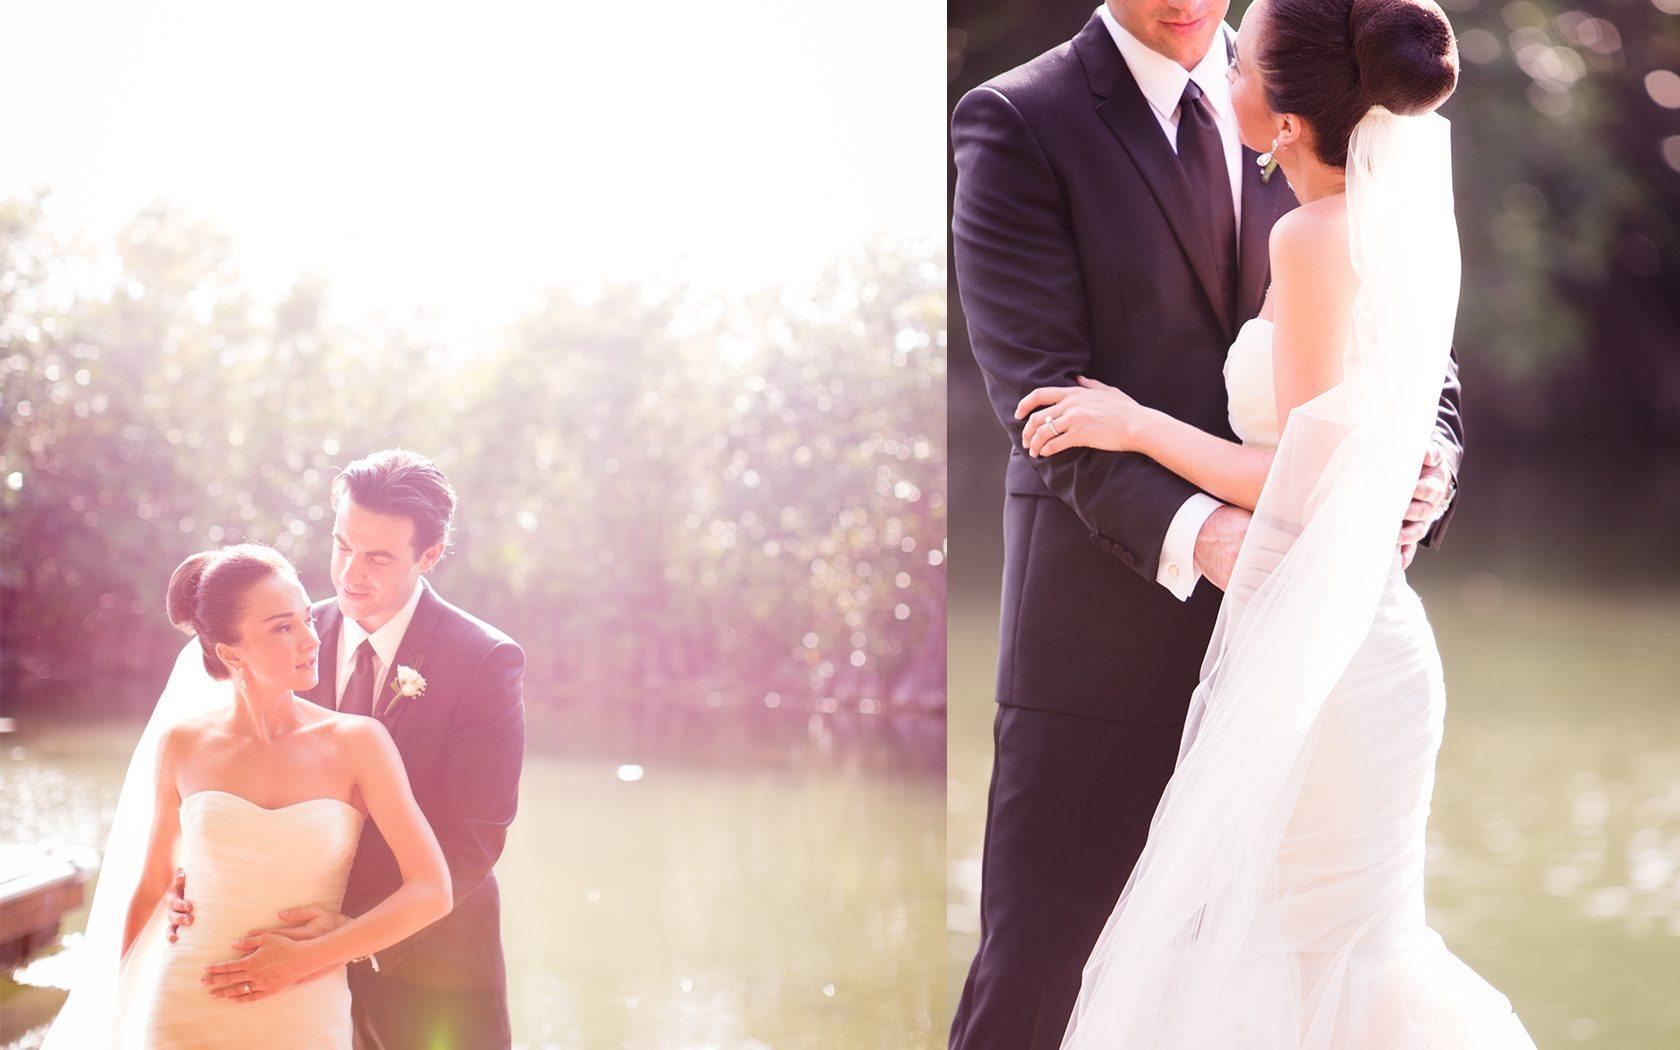 Fairmont_Mayakoba_Wedding_030-1680x1050.jpg